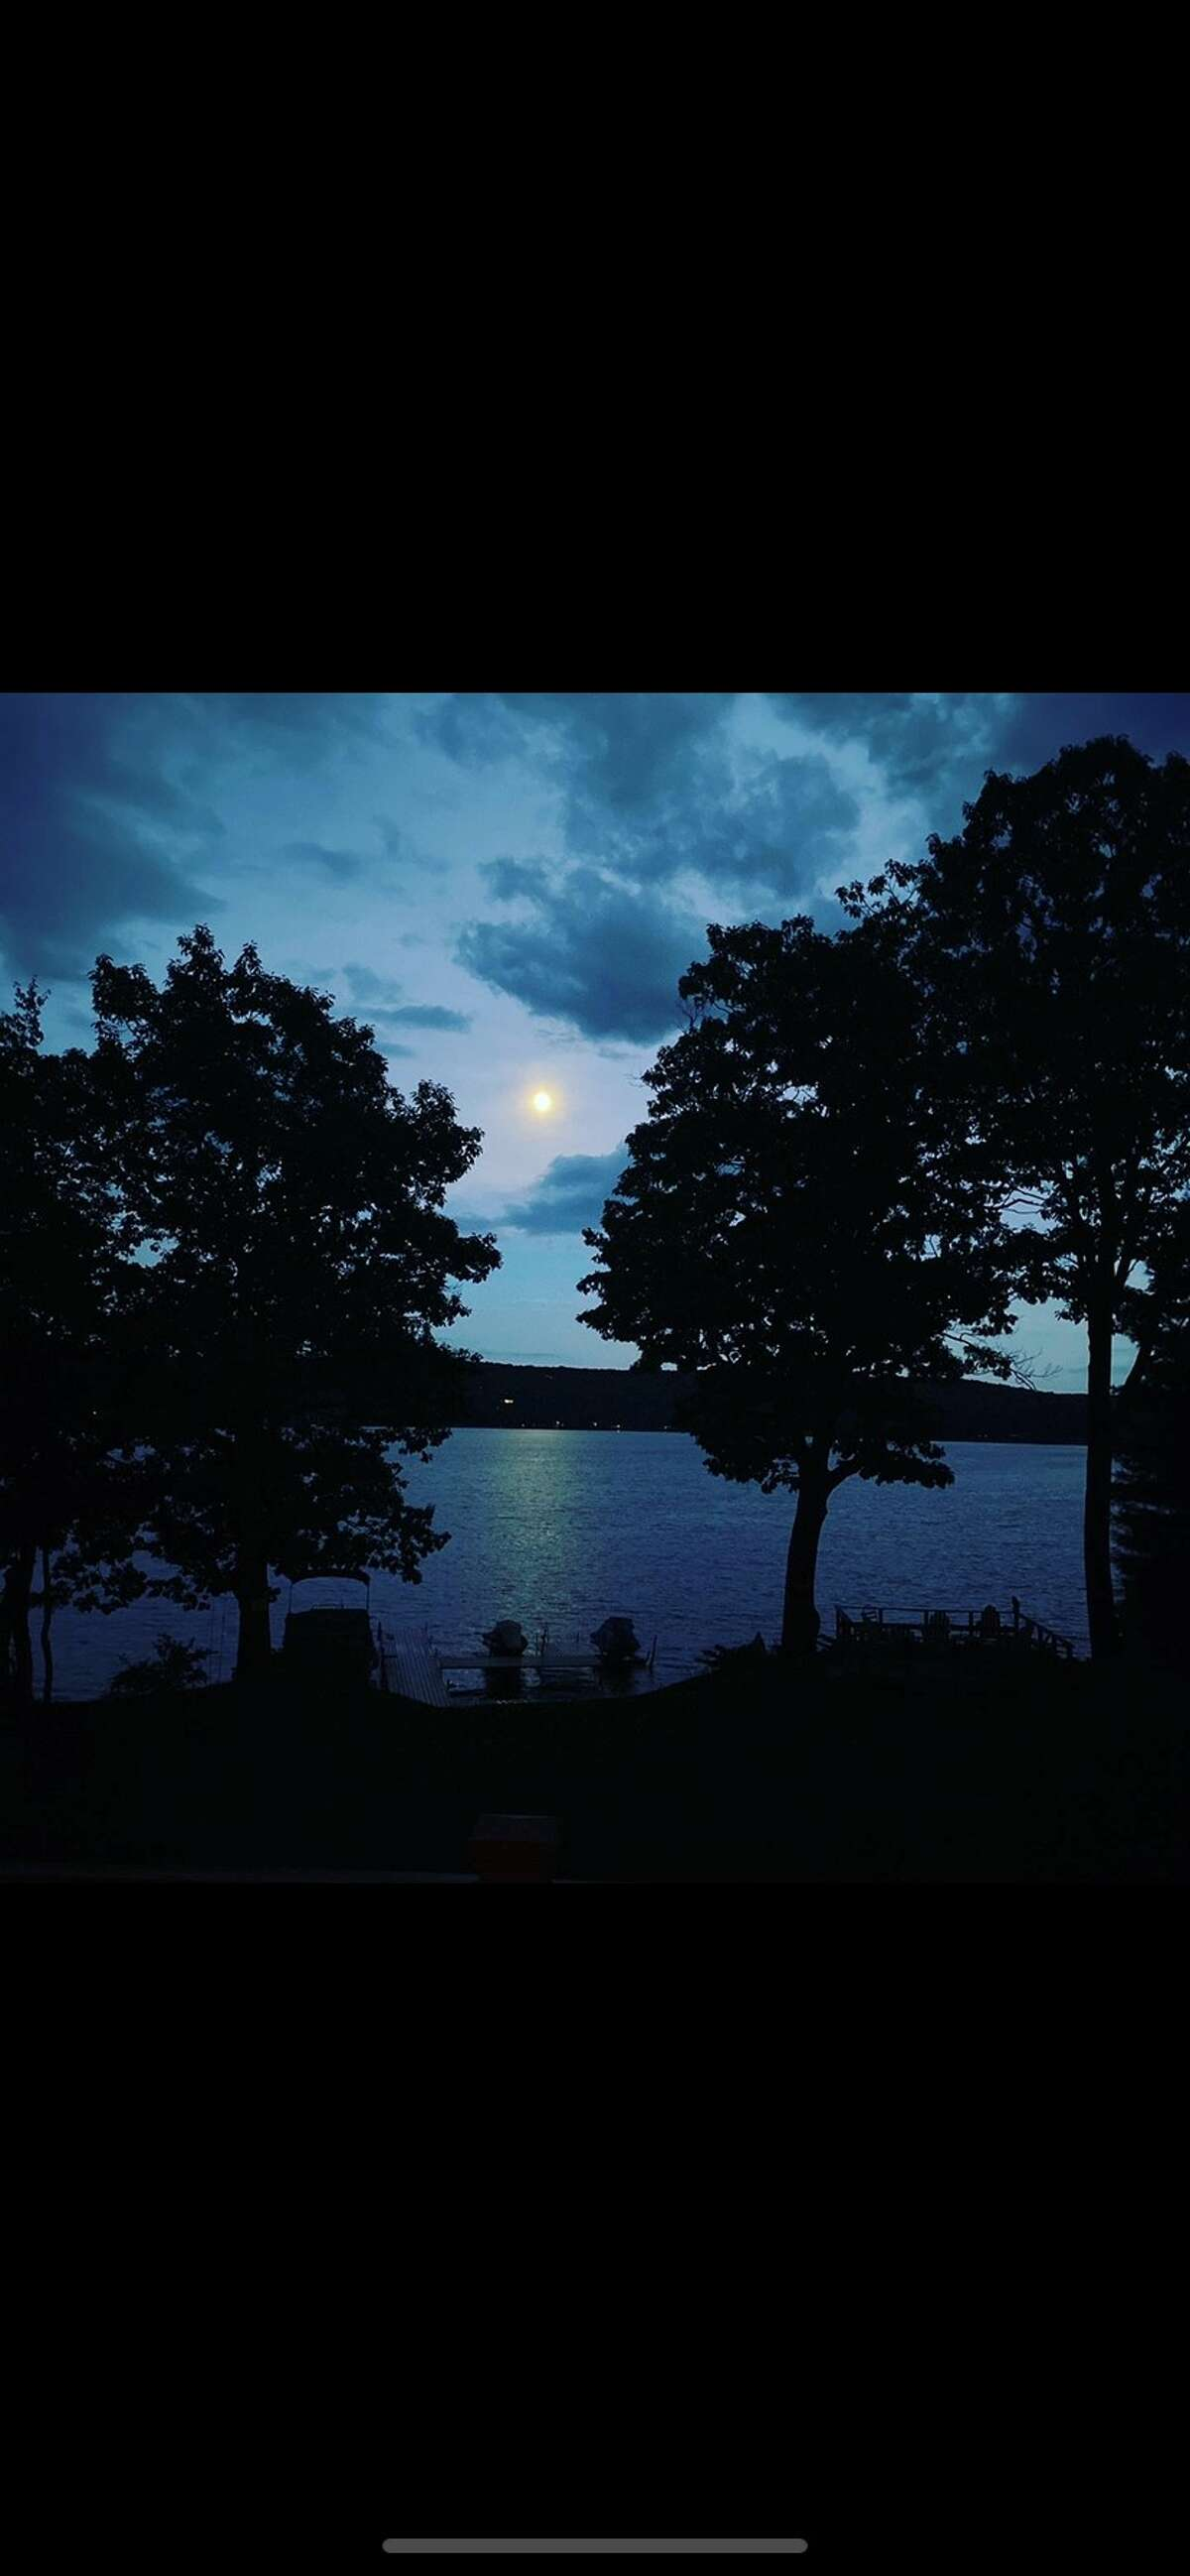 Full moon over Copake Lake, by Enzo Carlucci of Rensselaer